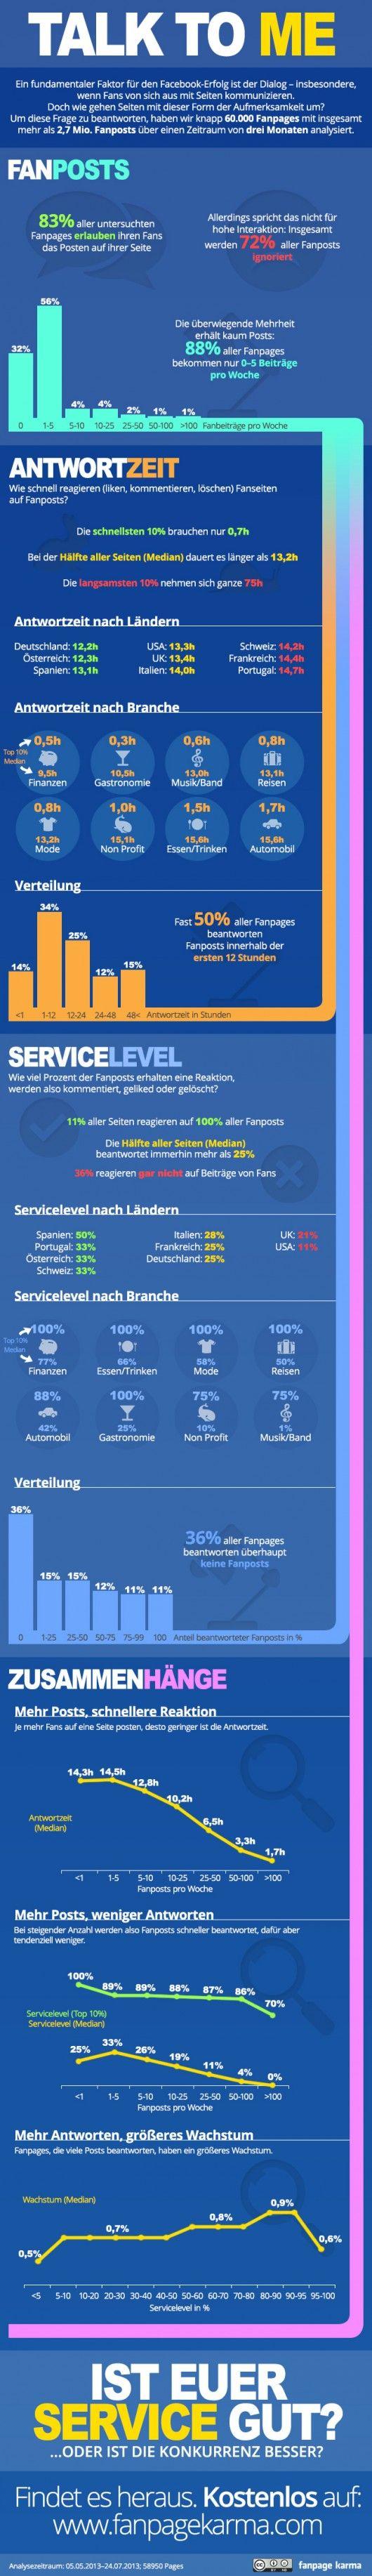 SLEVEL_Infographic_DE1